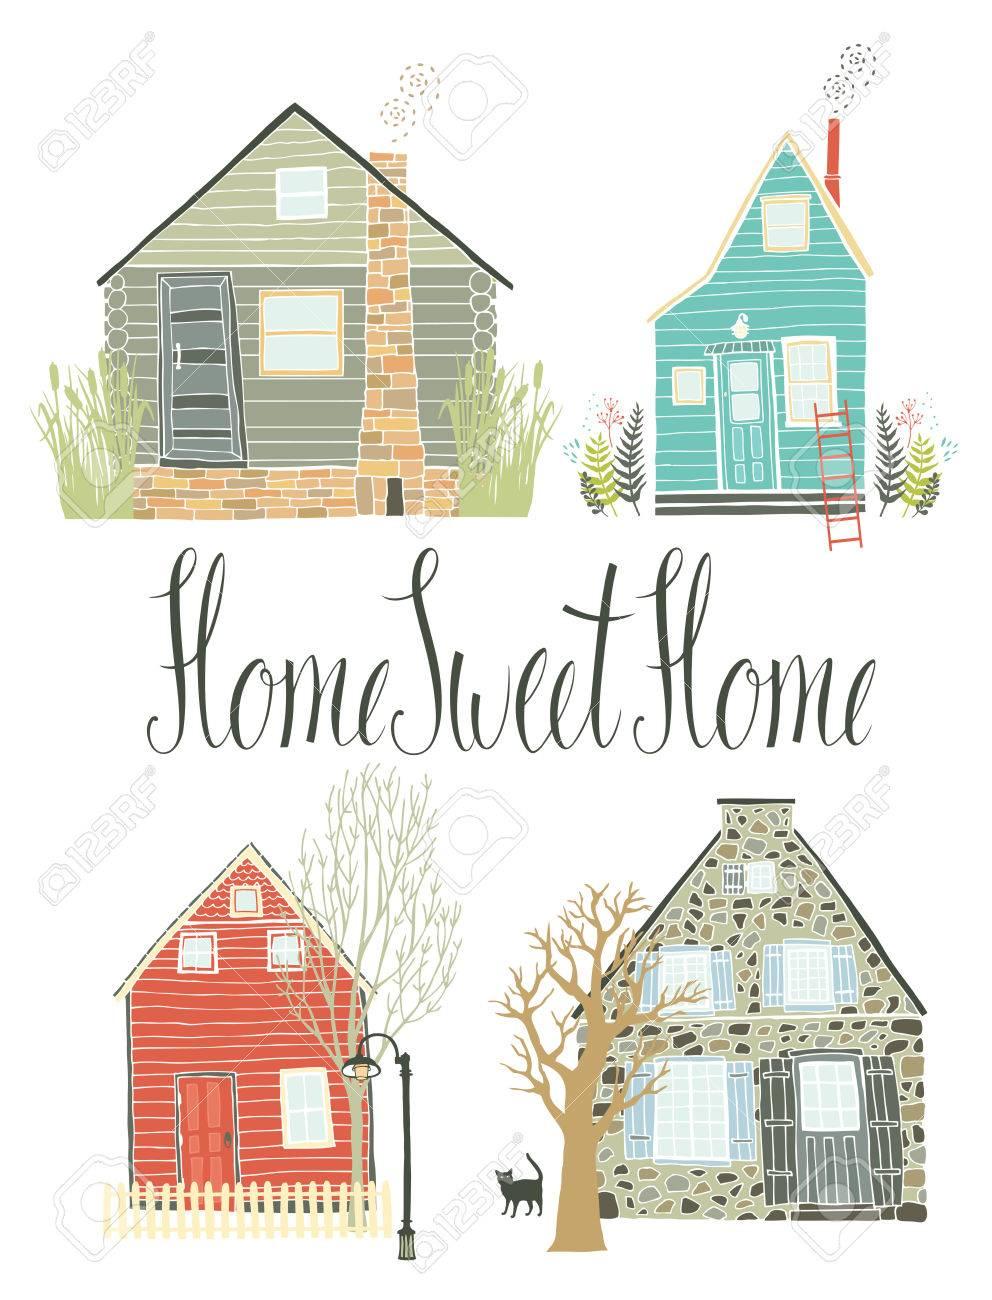 home design card. Home design card  House plans